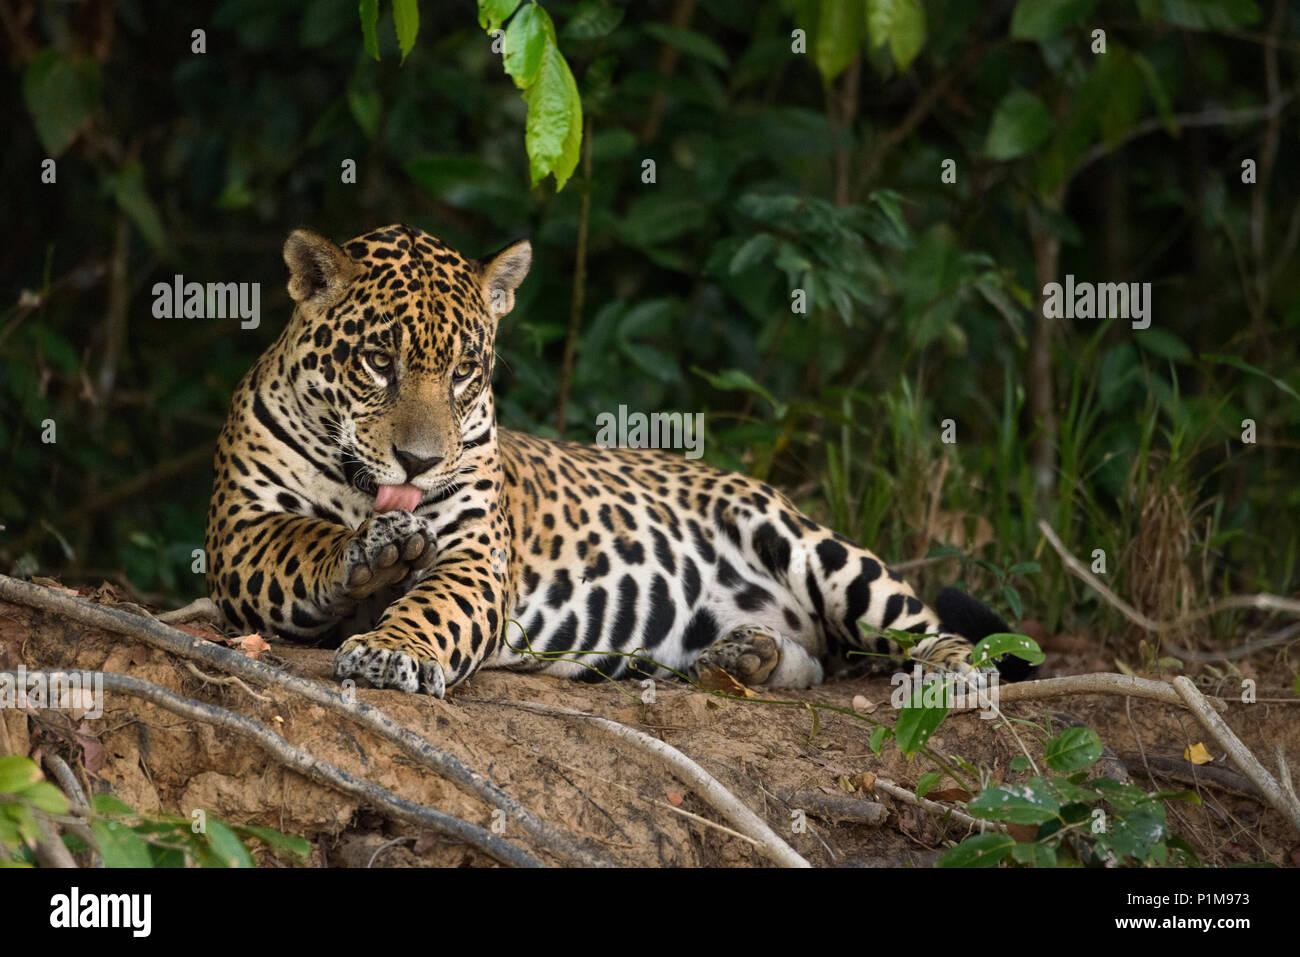 A Jaguar grooms itself in the Pantanal of Brazil. - Stock Image